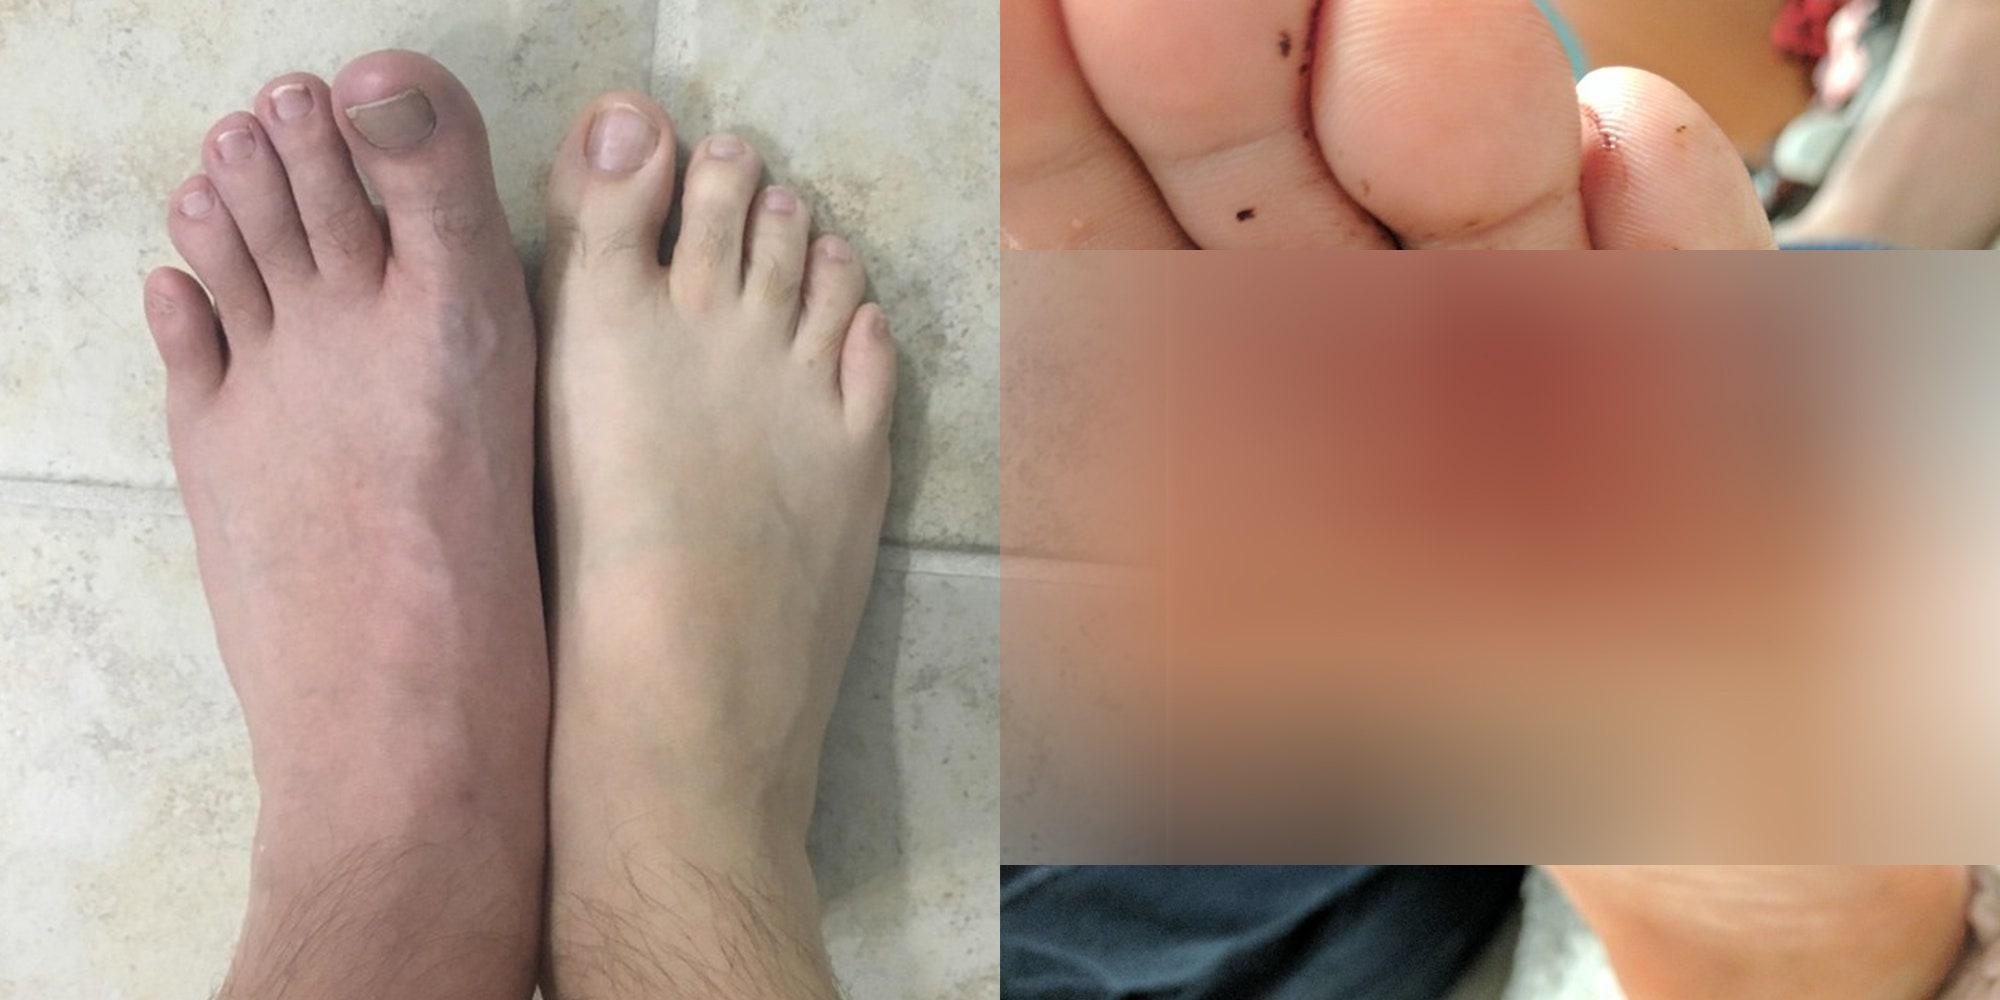 plantar wart on foot itchy papilloma virus sintomi perdite